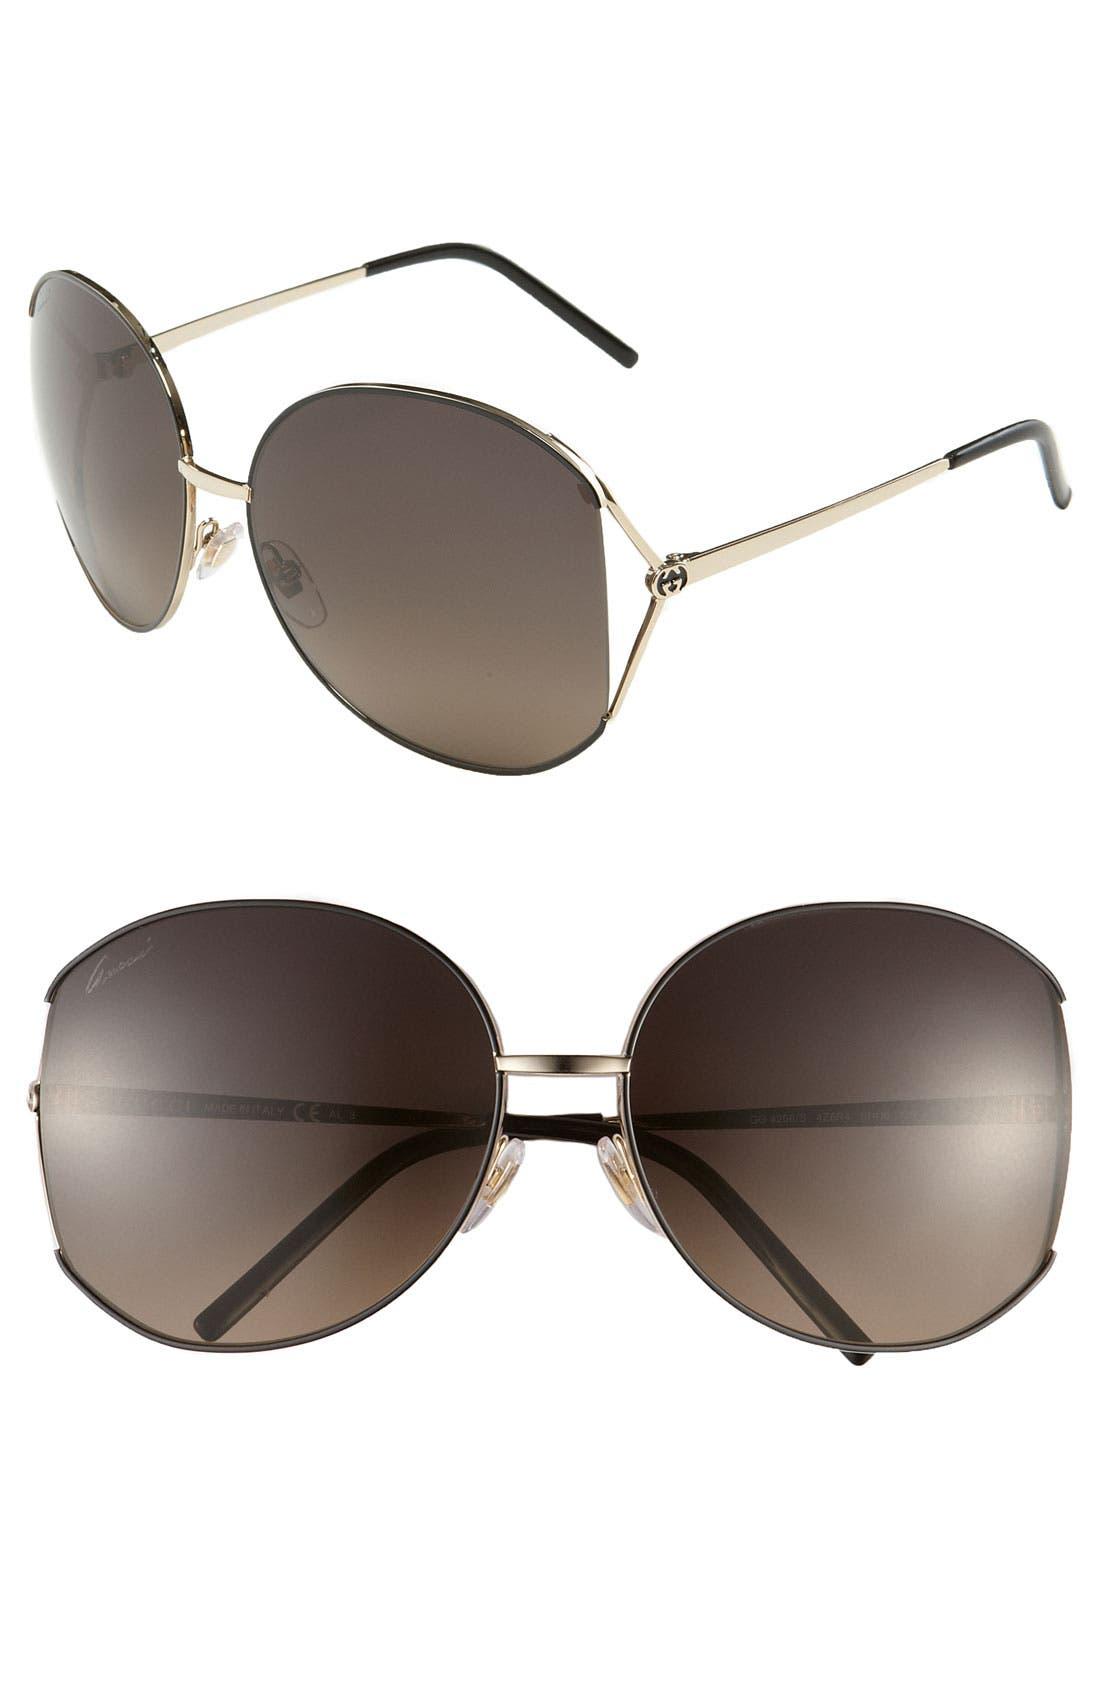 Main Image - Gucci 61mm Sunglasses